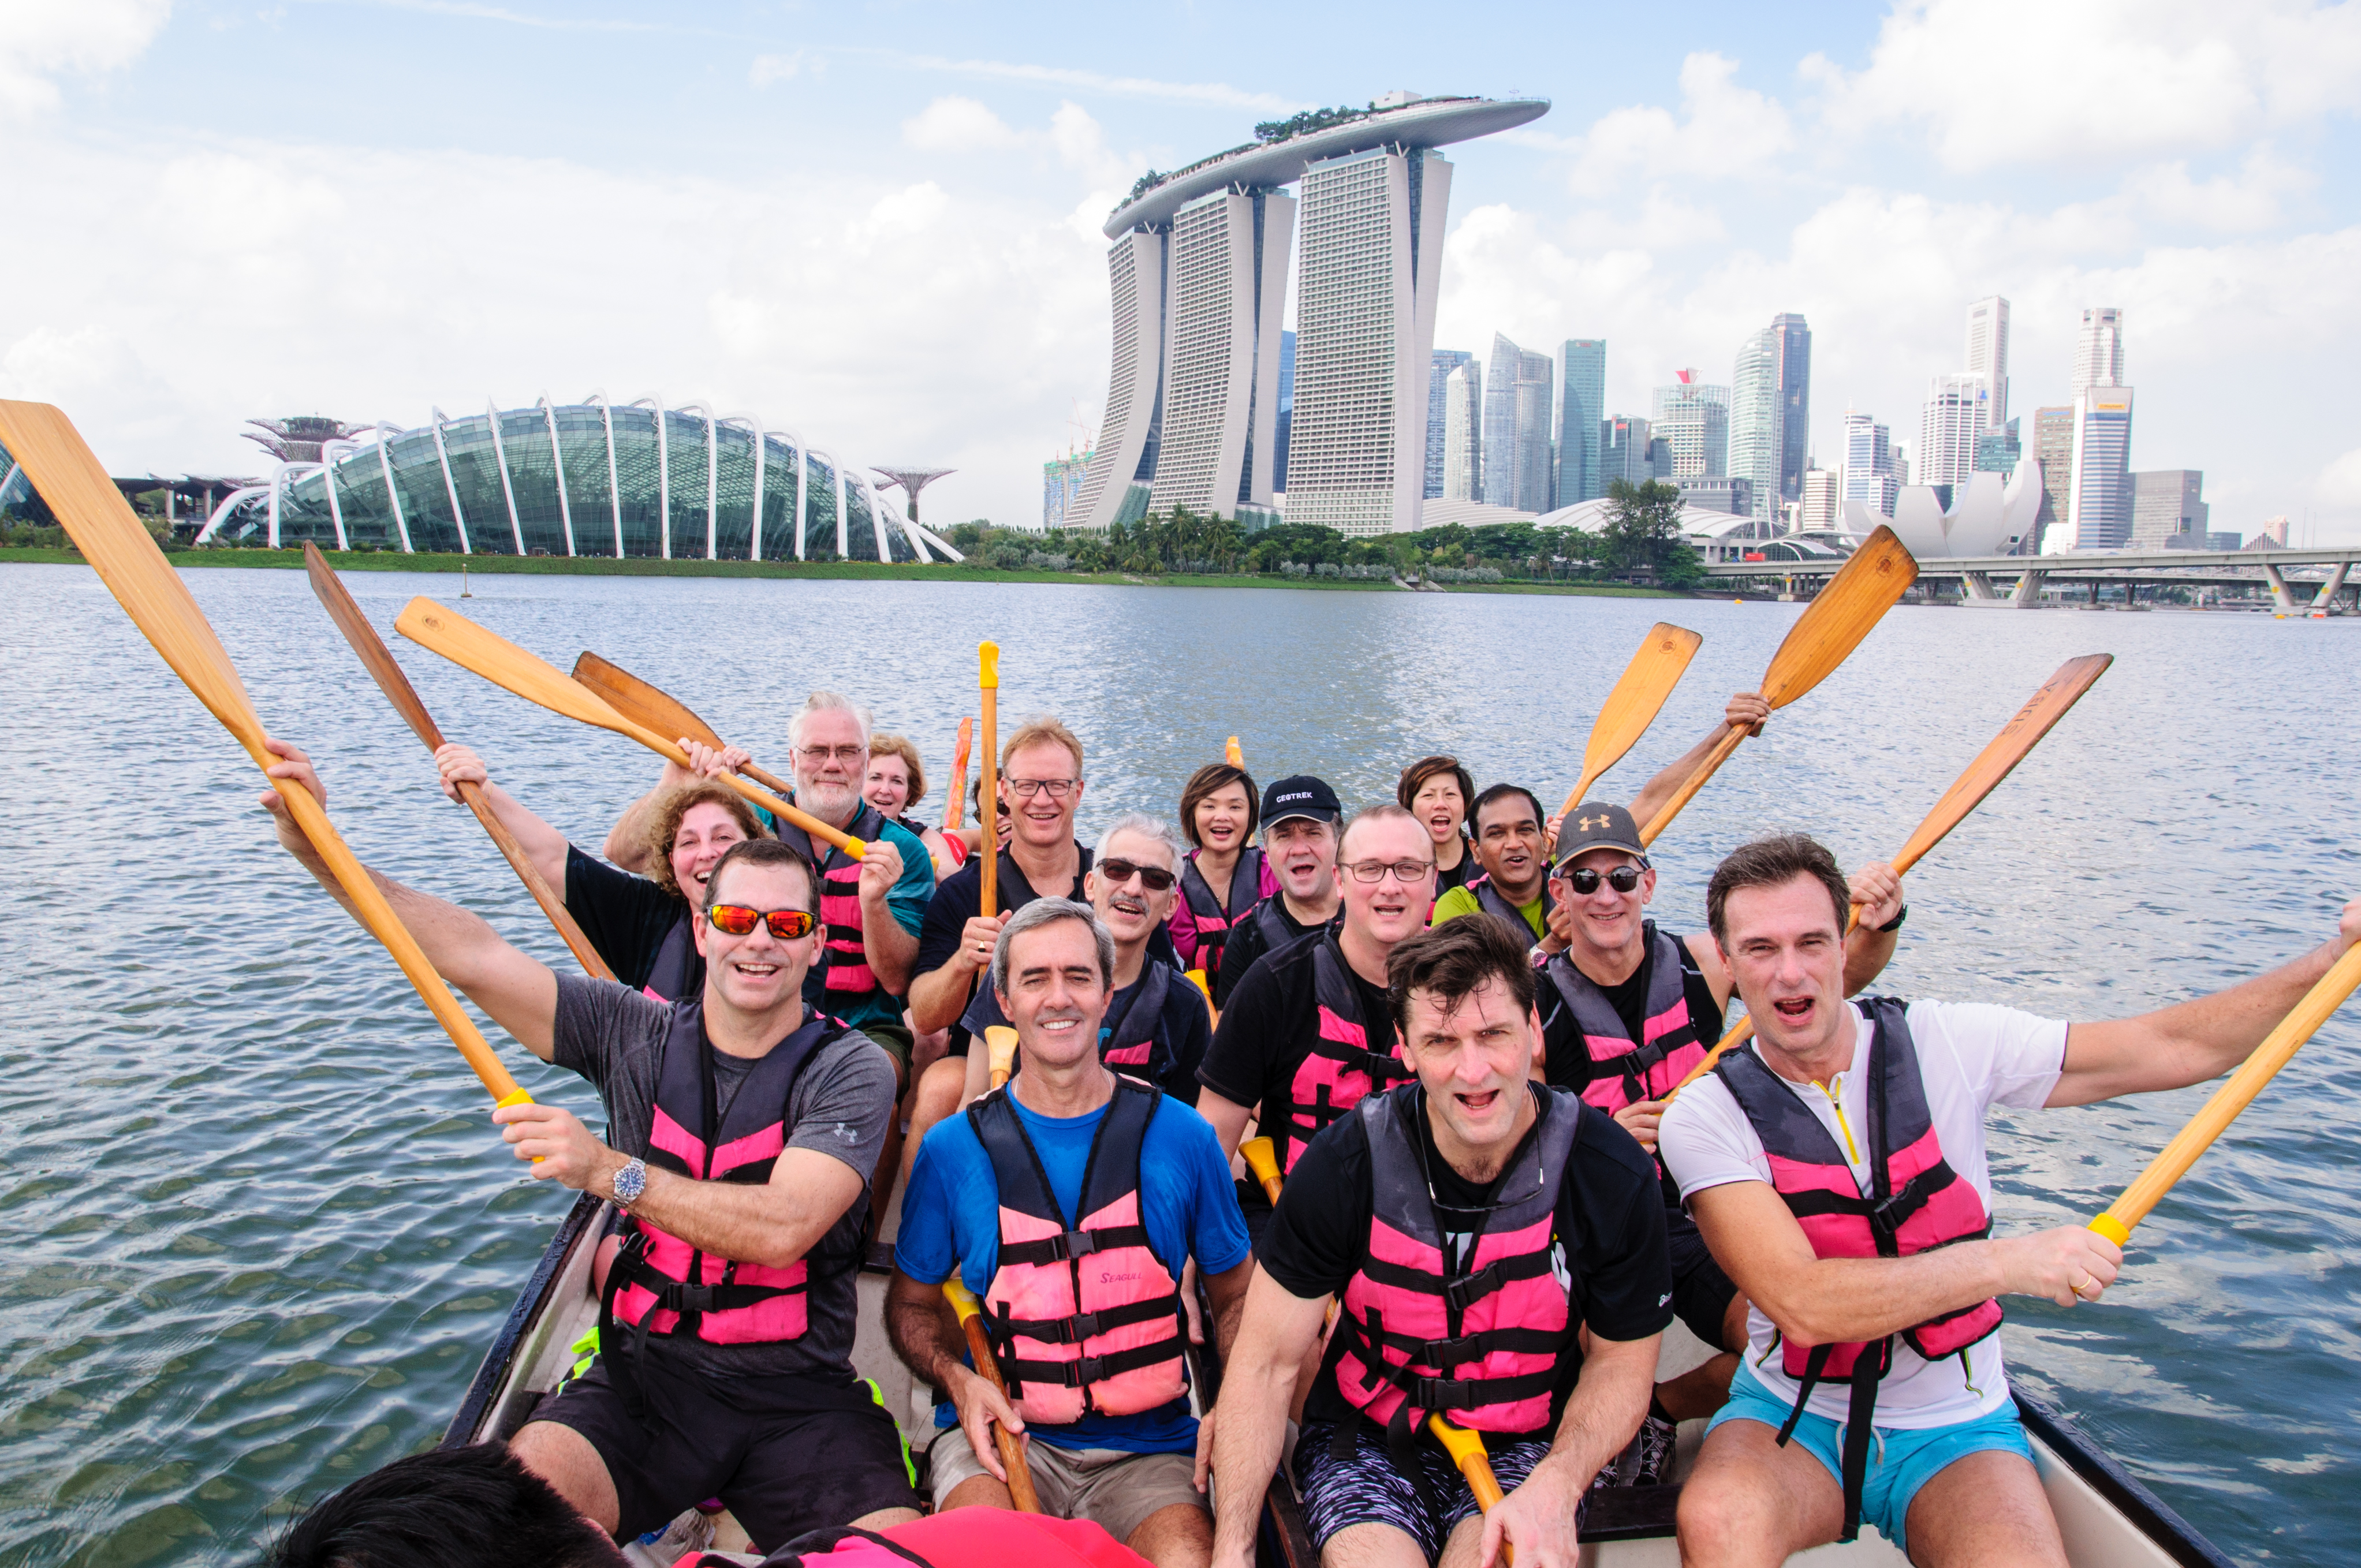 Team Building Activities Singapore, Team Bonding Activities